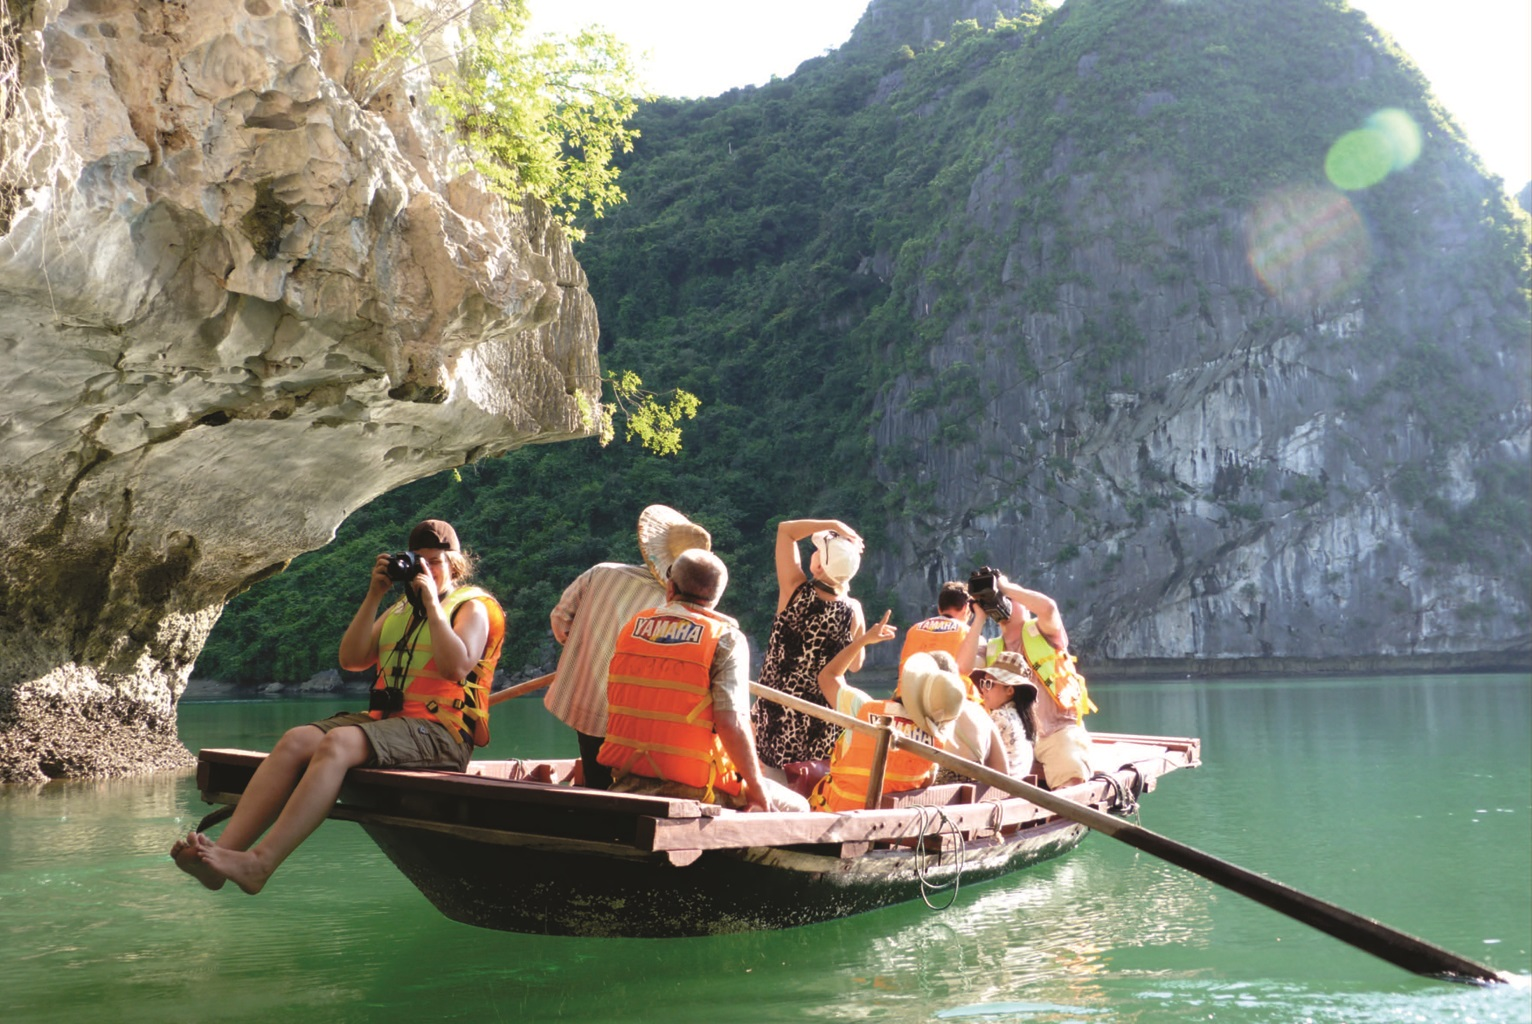 Halong Bay - The legendary beauty